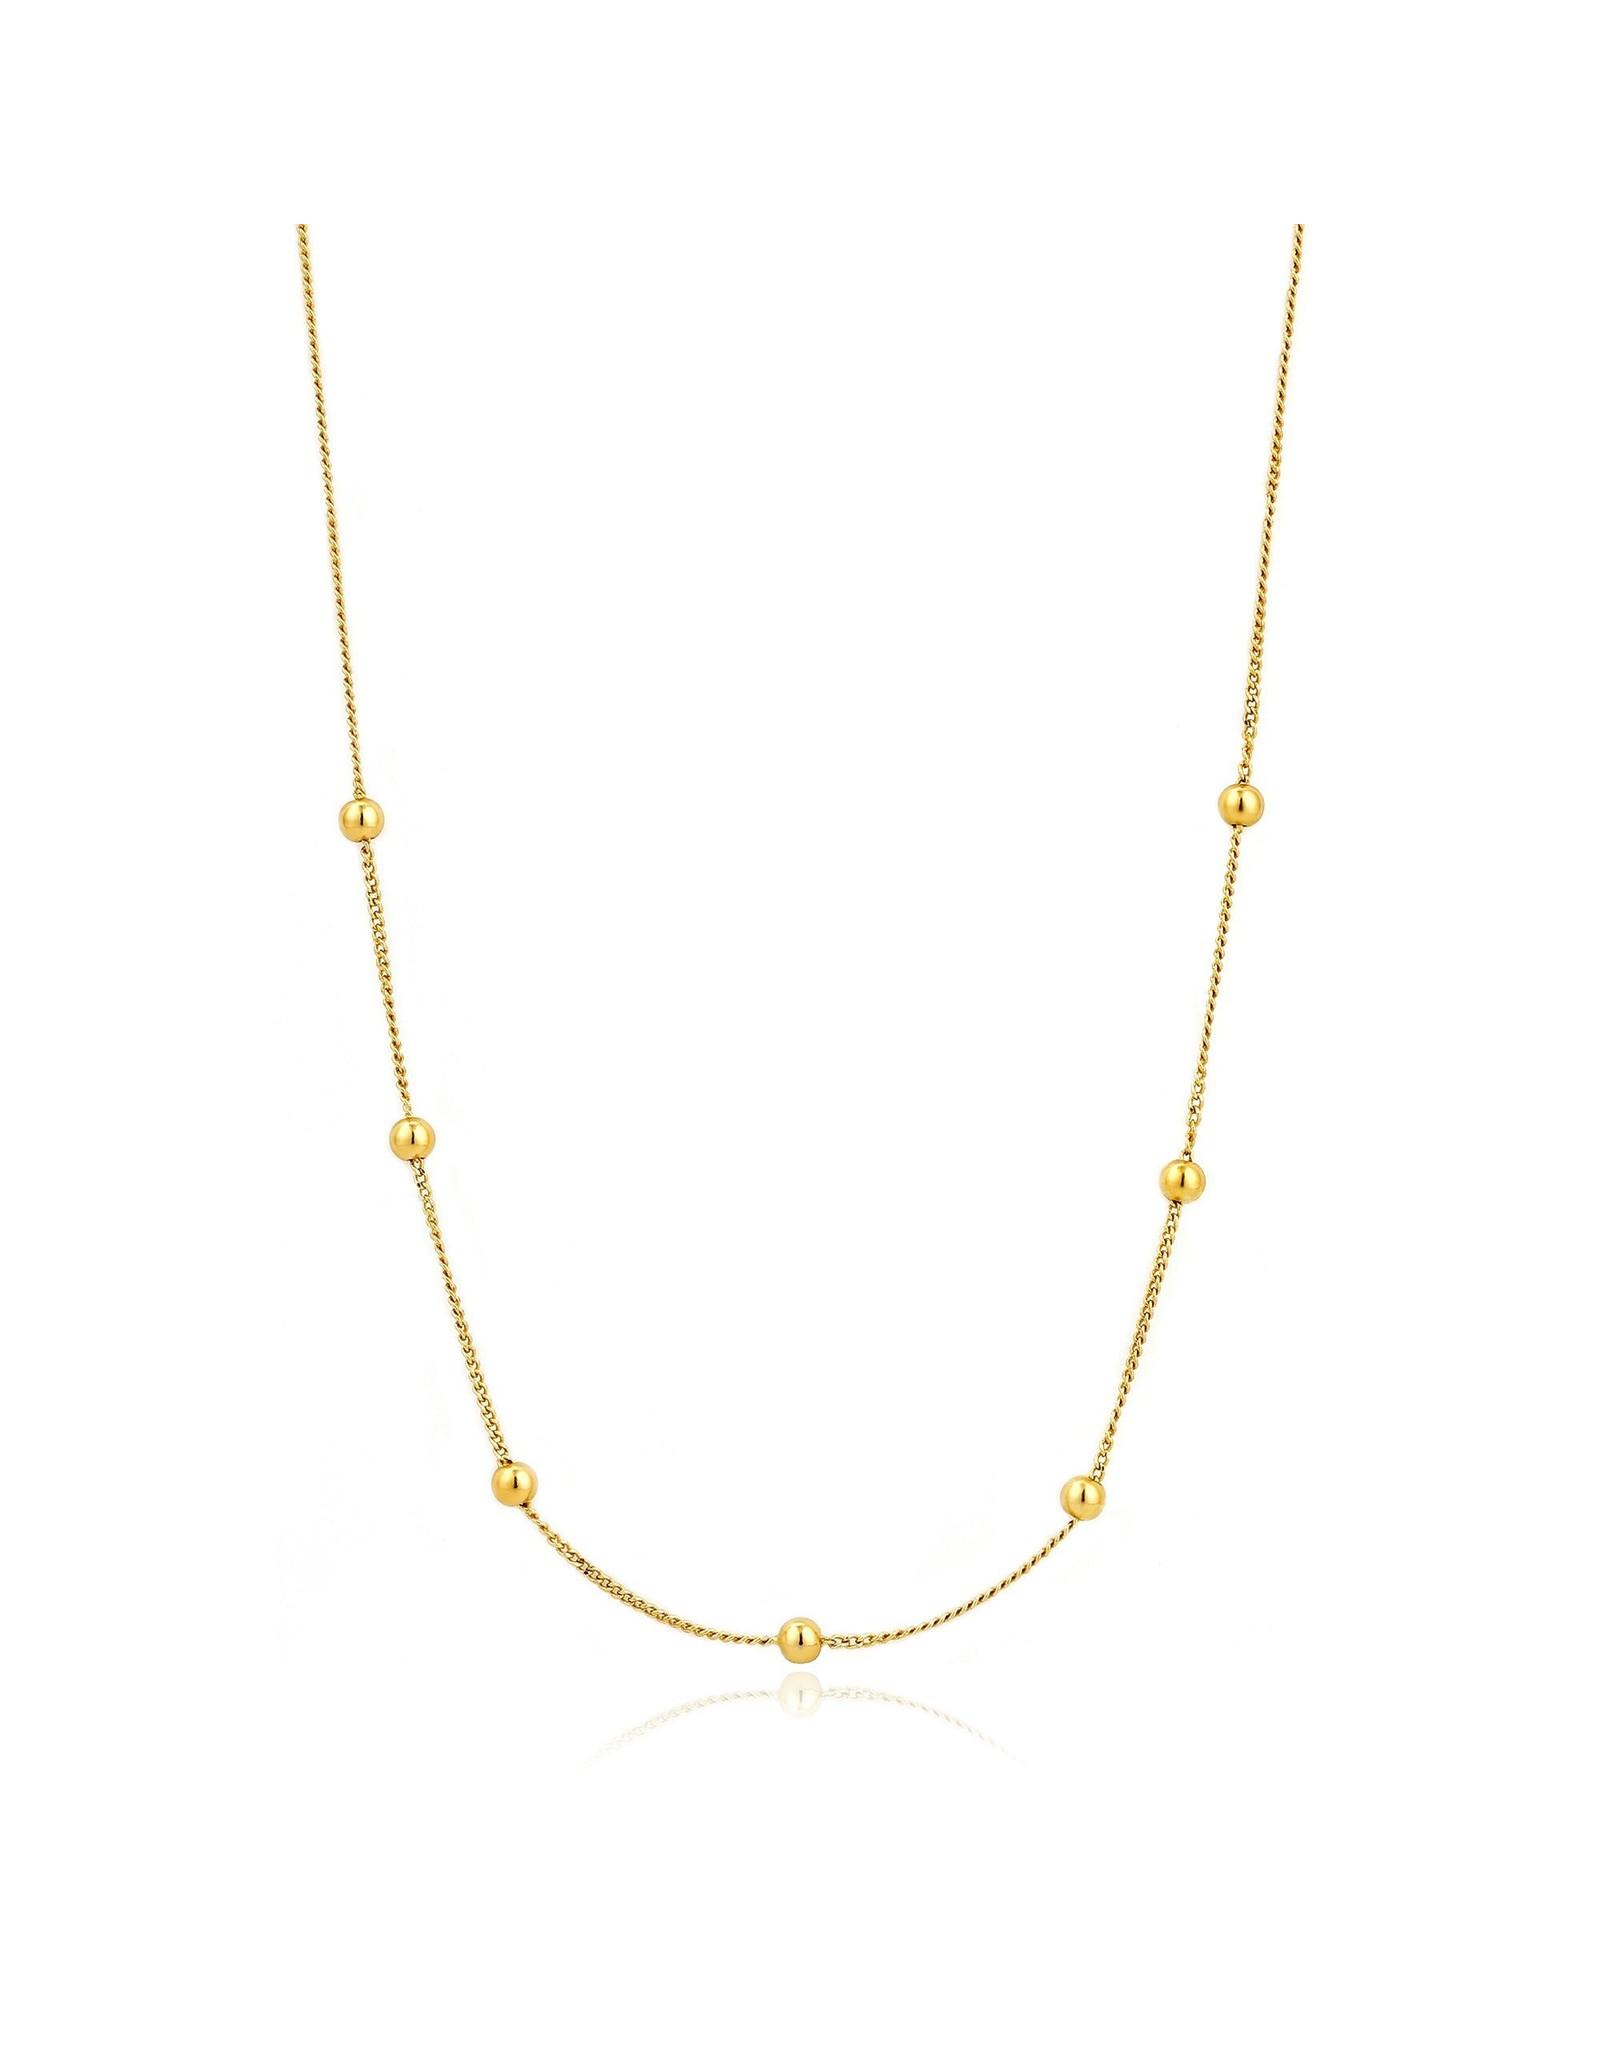 Ania Haie Modern Beaded Necklace, Gold